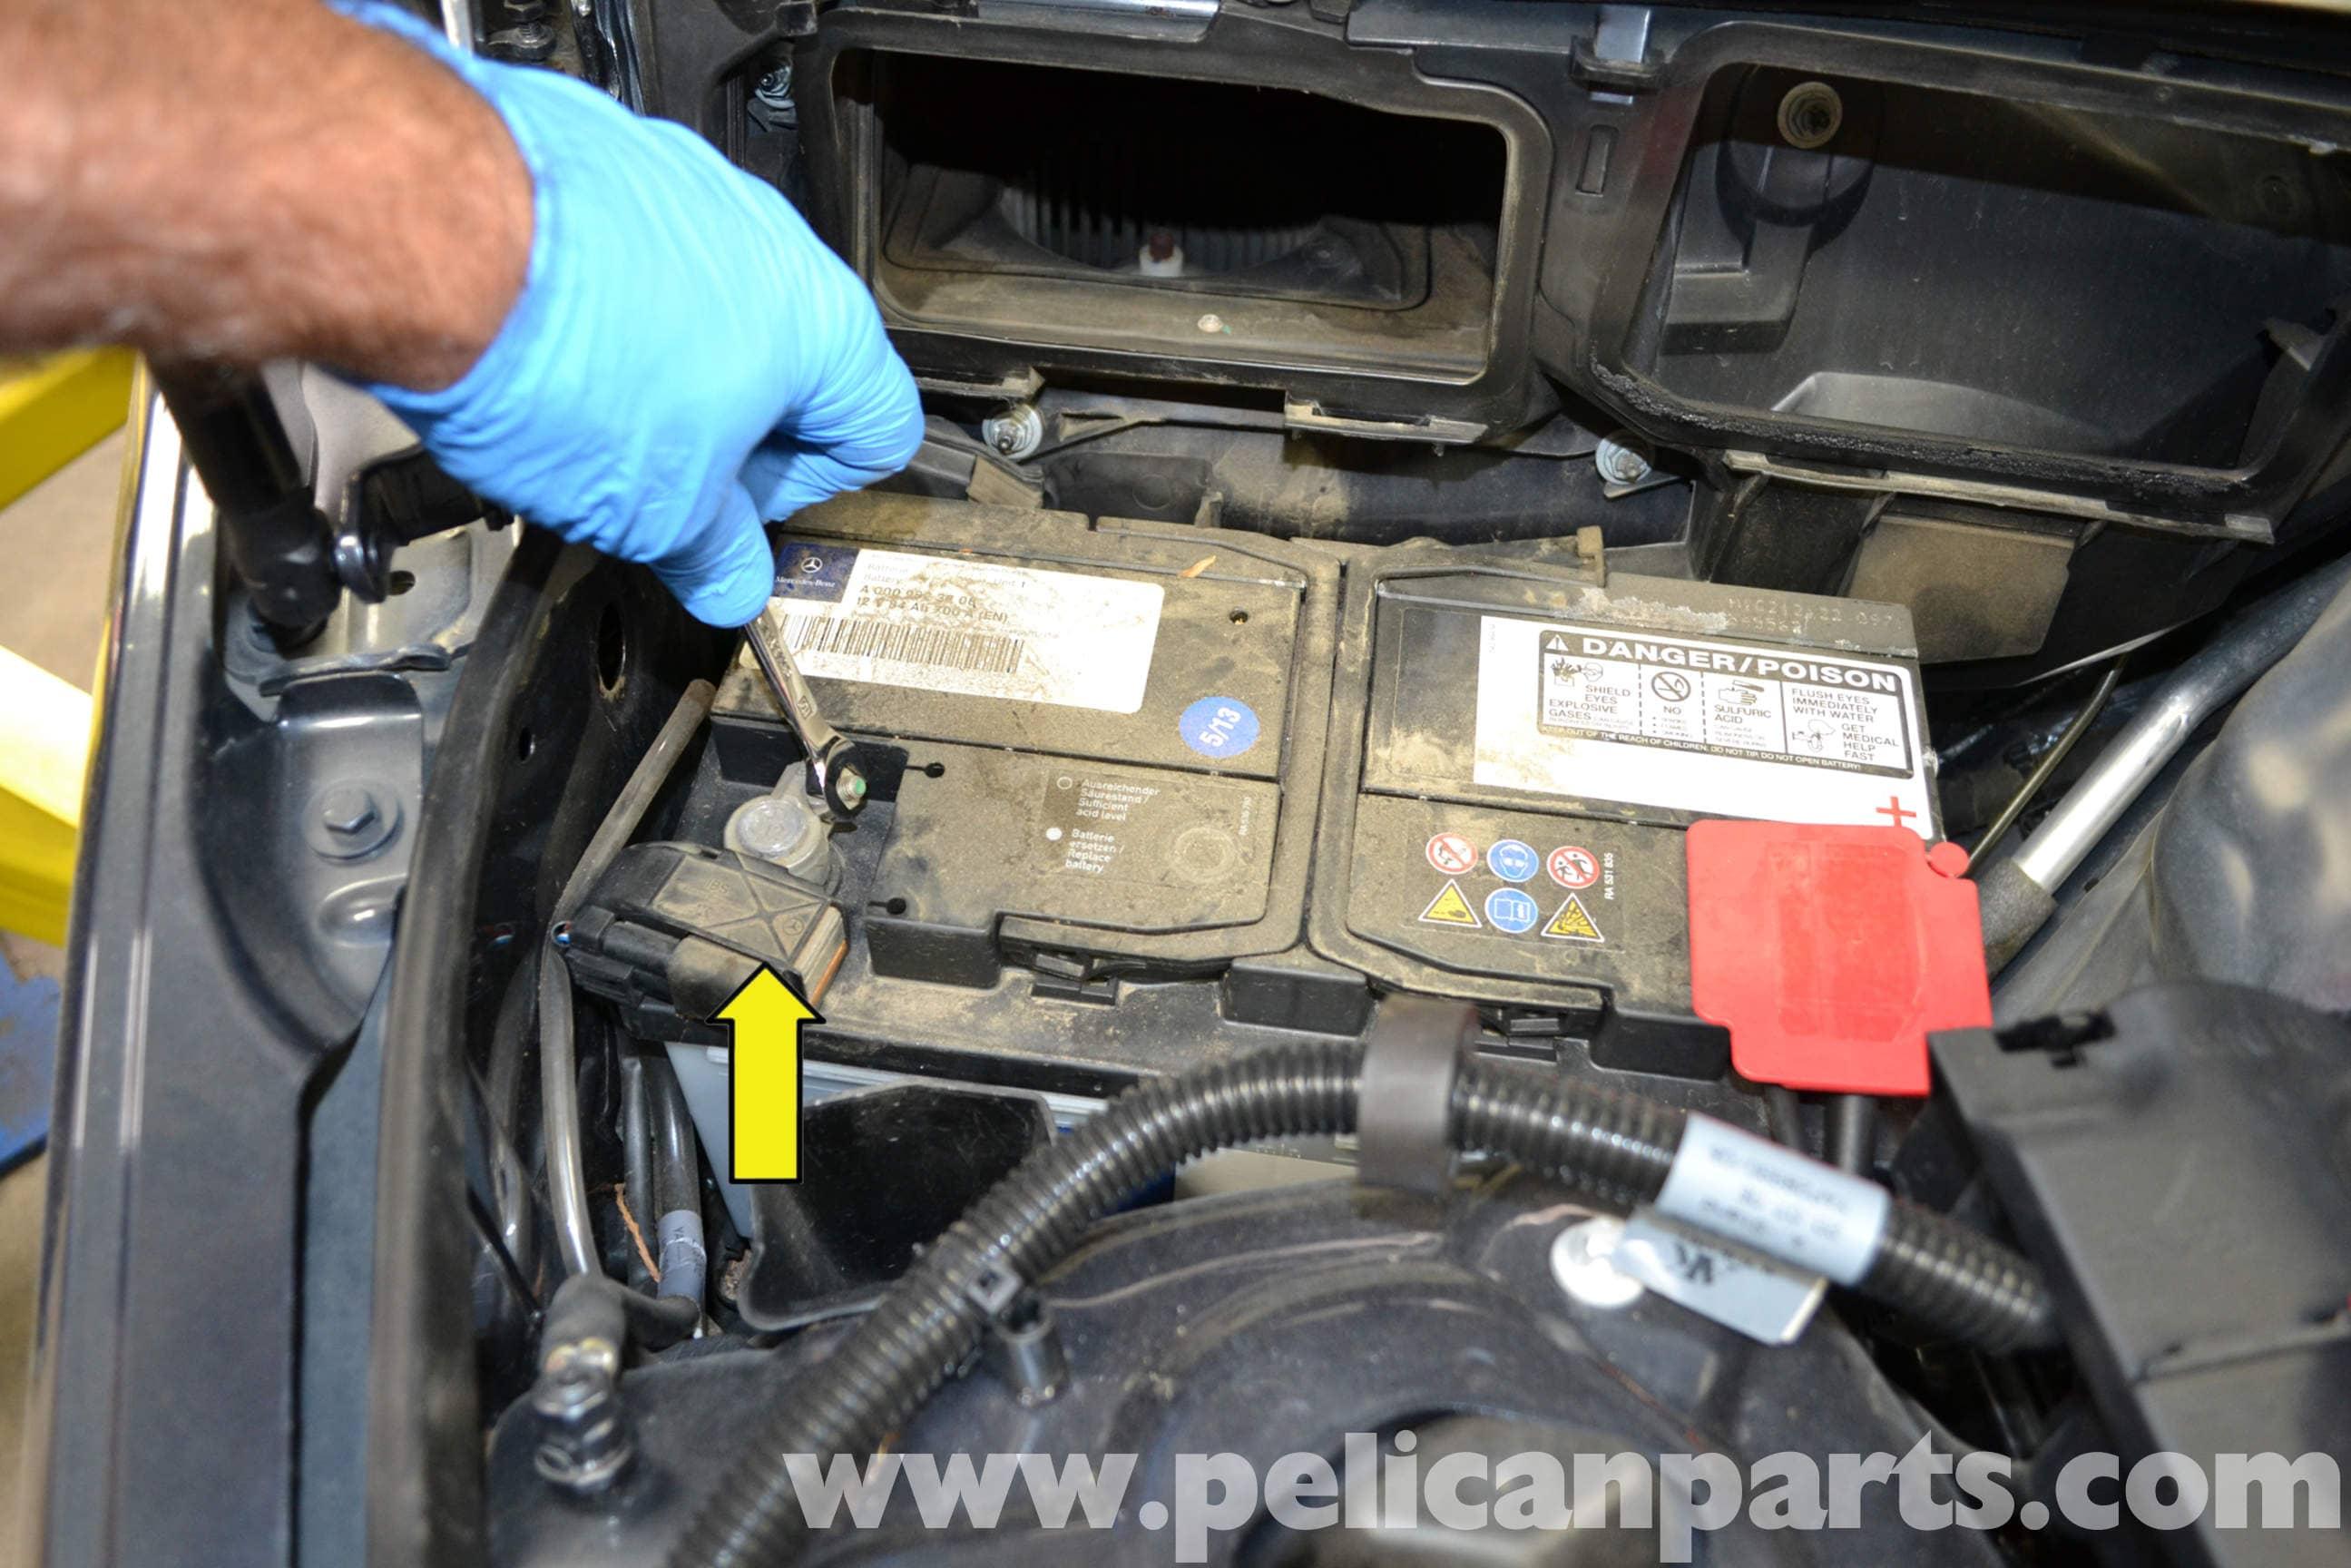 Mercedes Benz W204 Alternator Replacement 2008 2014 C250 C300 Glk 350 Engine Diagram Large Image